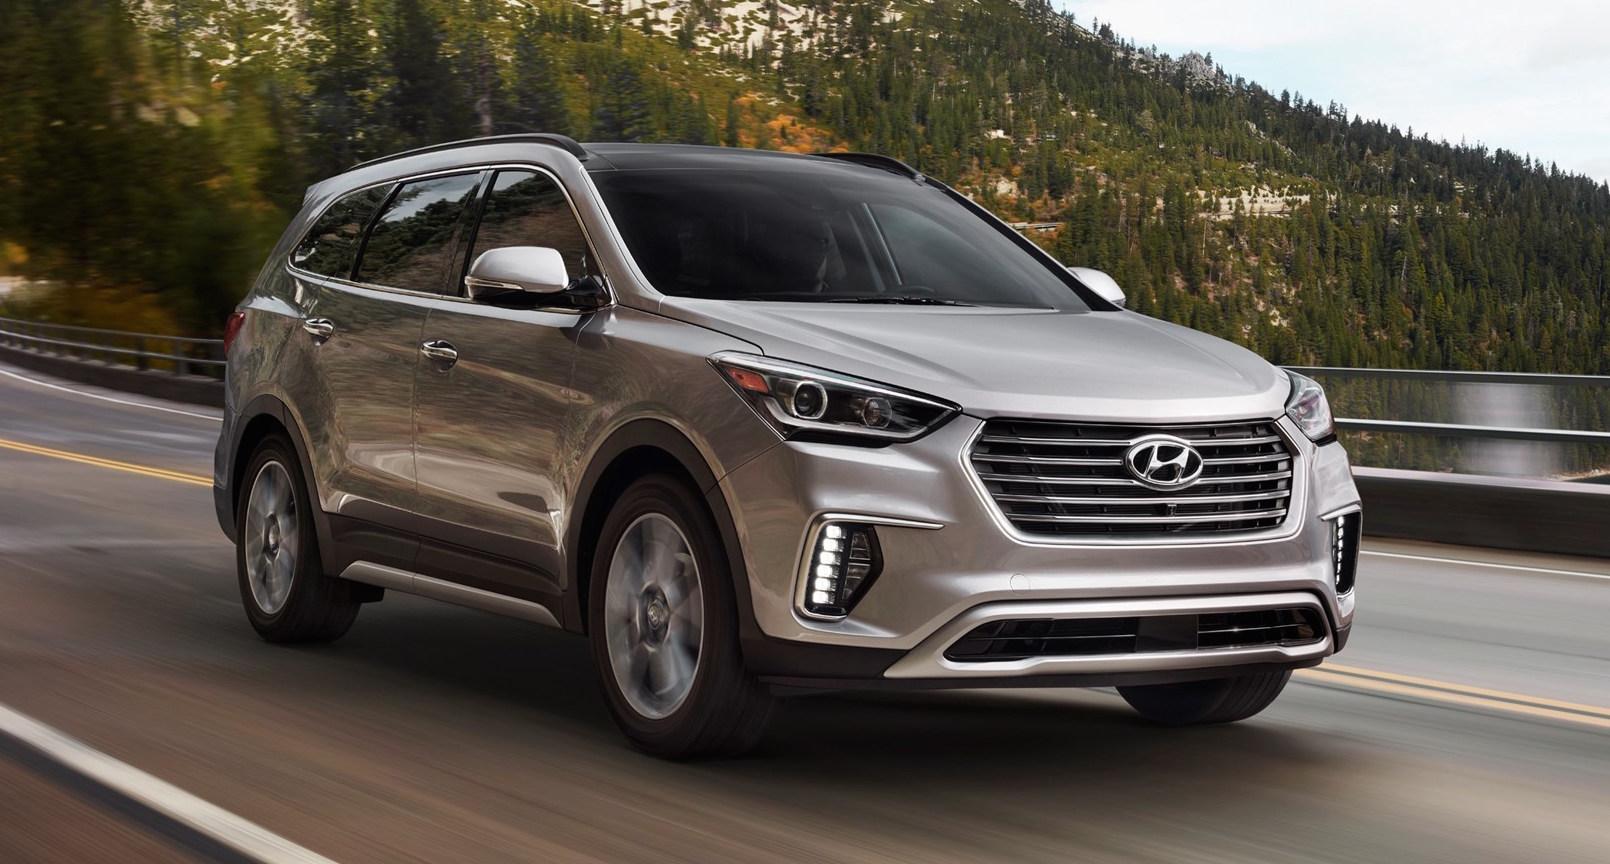 2016 Hyundai Santa Fe >> 2017 Hyundai Sante Fe and Sante Fe Sport for the US Image 440265